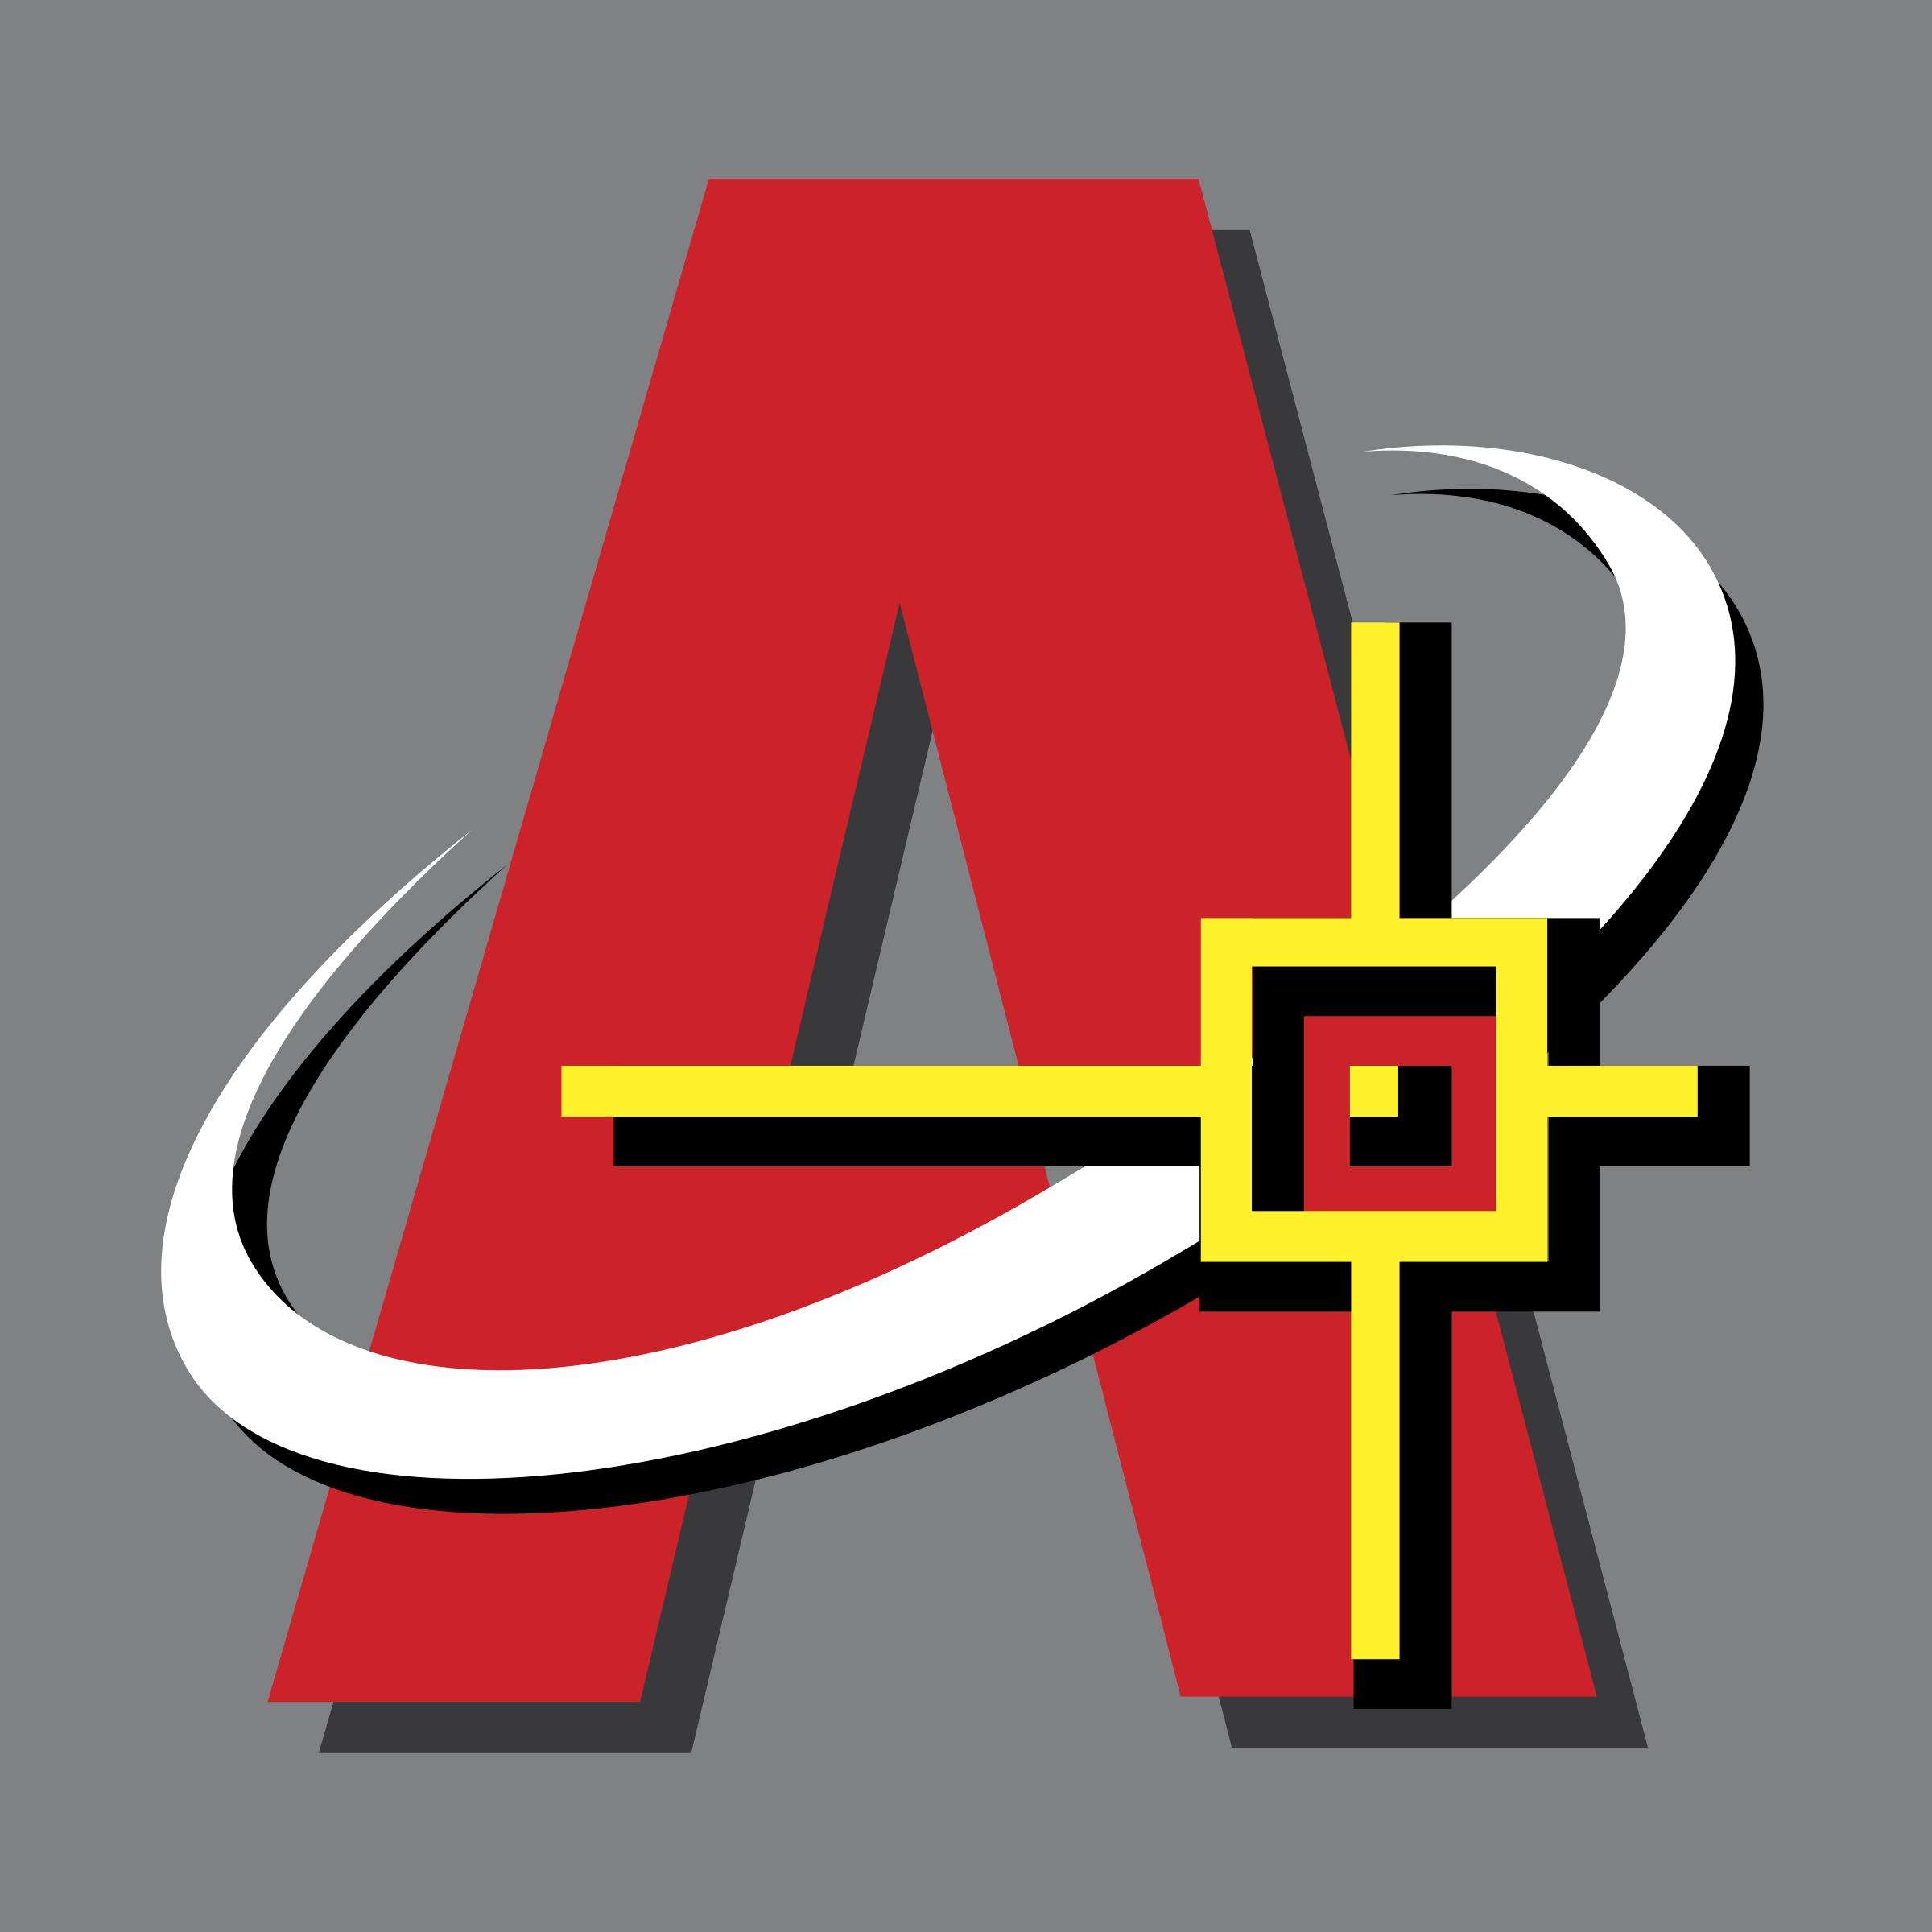 Autocad 2000 Logo Png Transparent & Svg Vector - Pluspng Pluspng.com - Acad Logo PNG